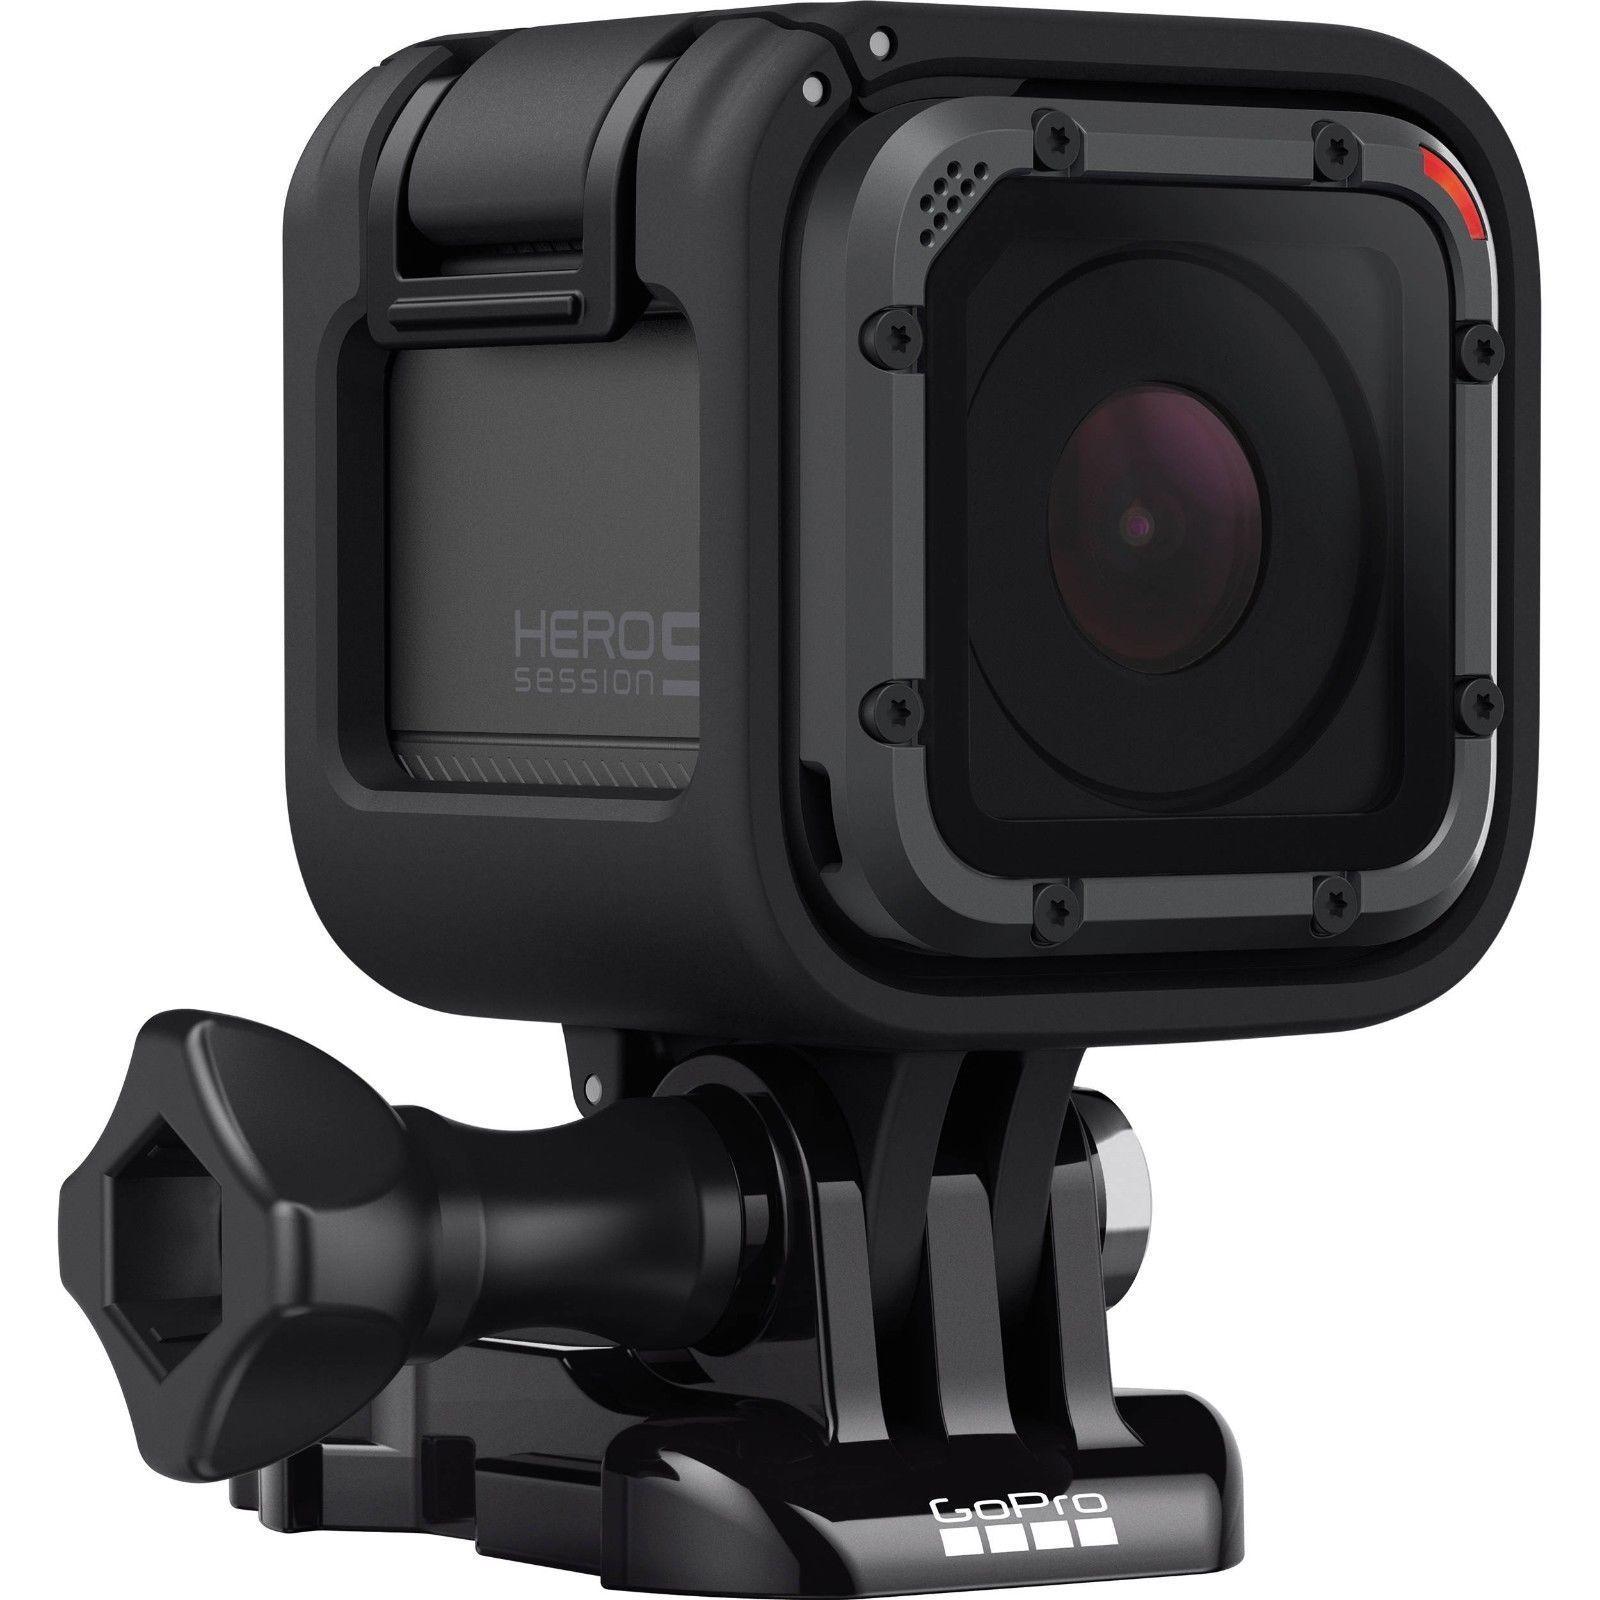 GoPro Hero5 Session 4K Extraordinarily HD, Waterproof Movement Digicam Model brand new sealed